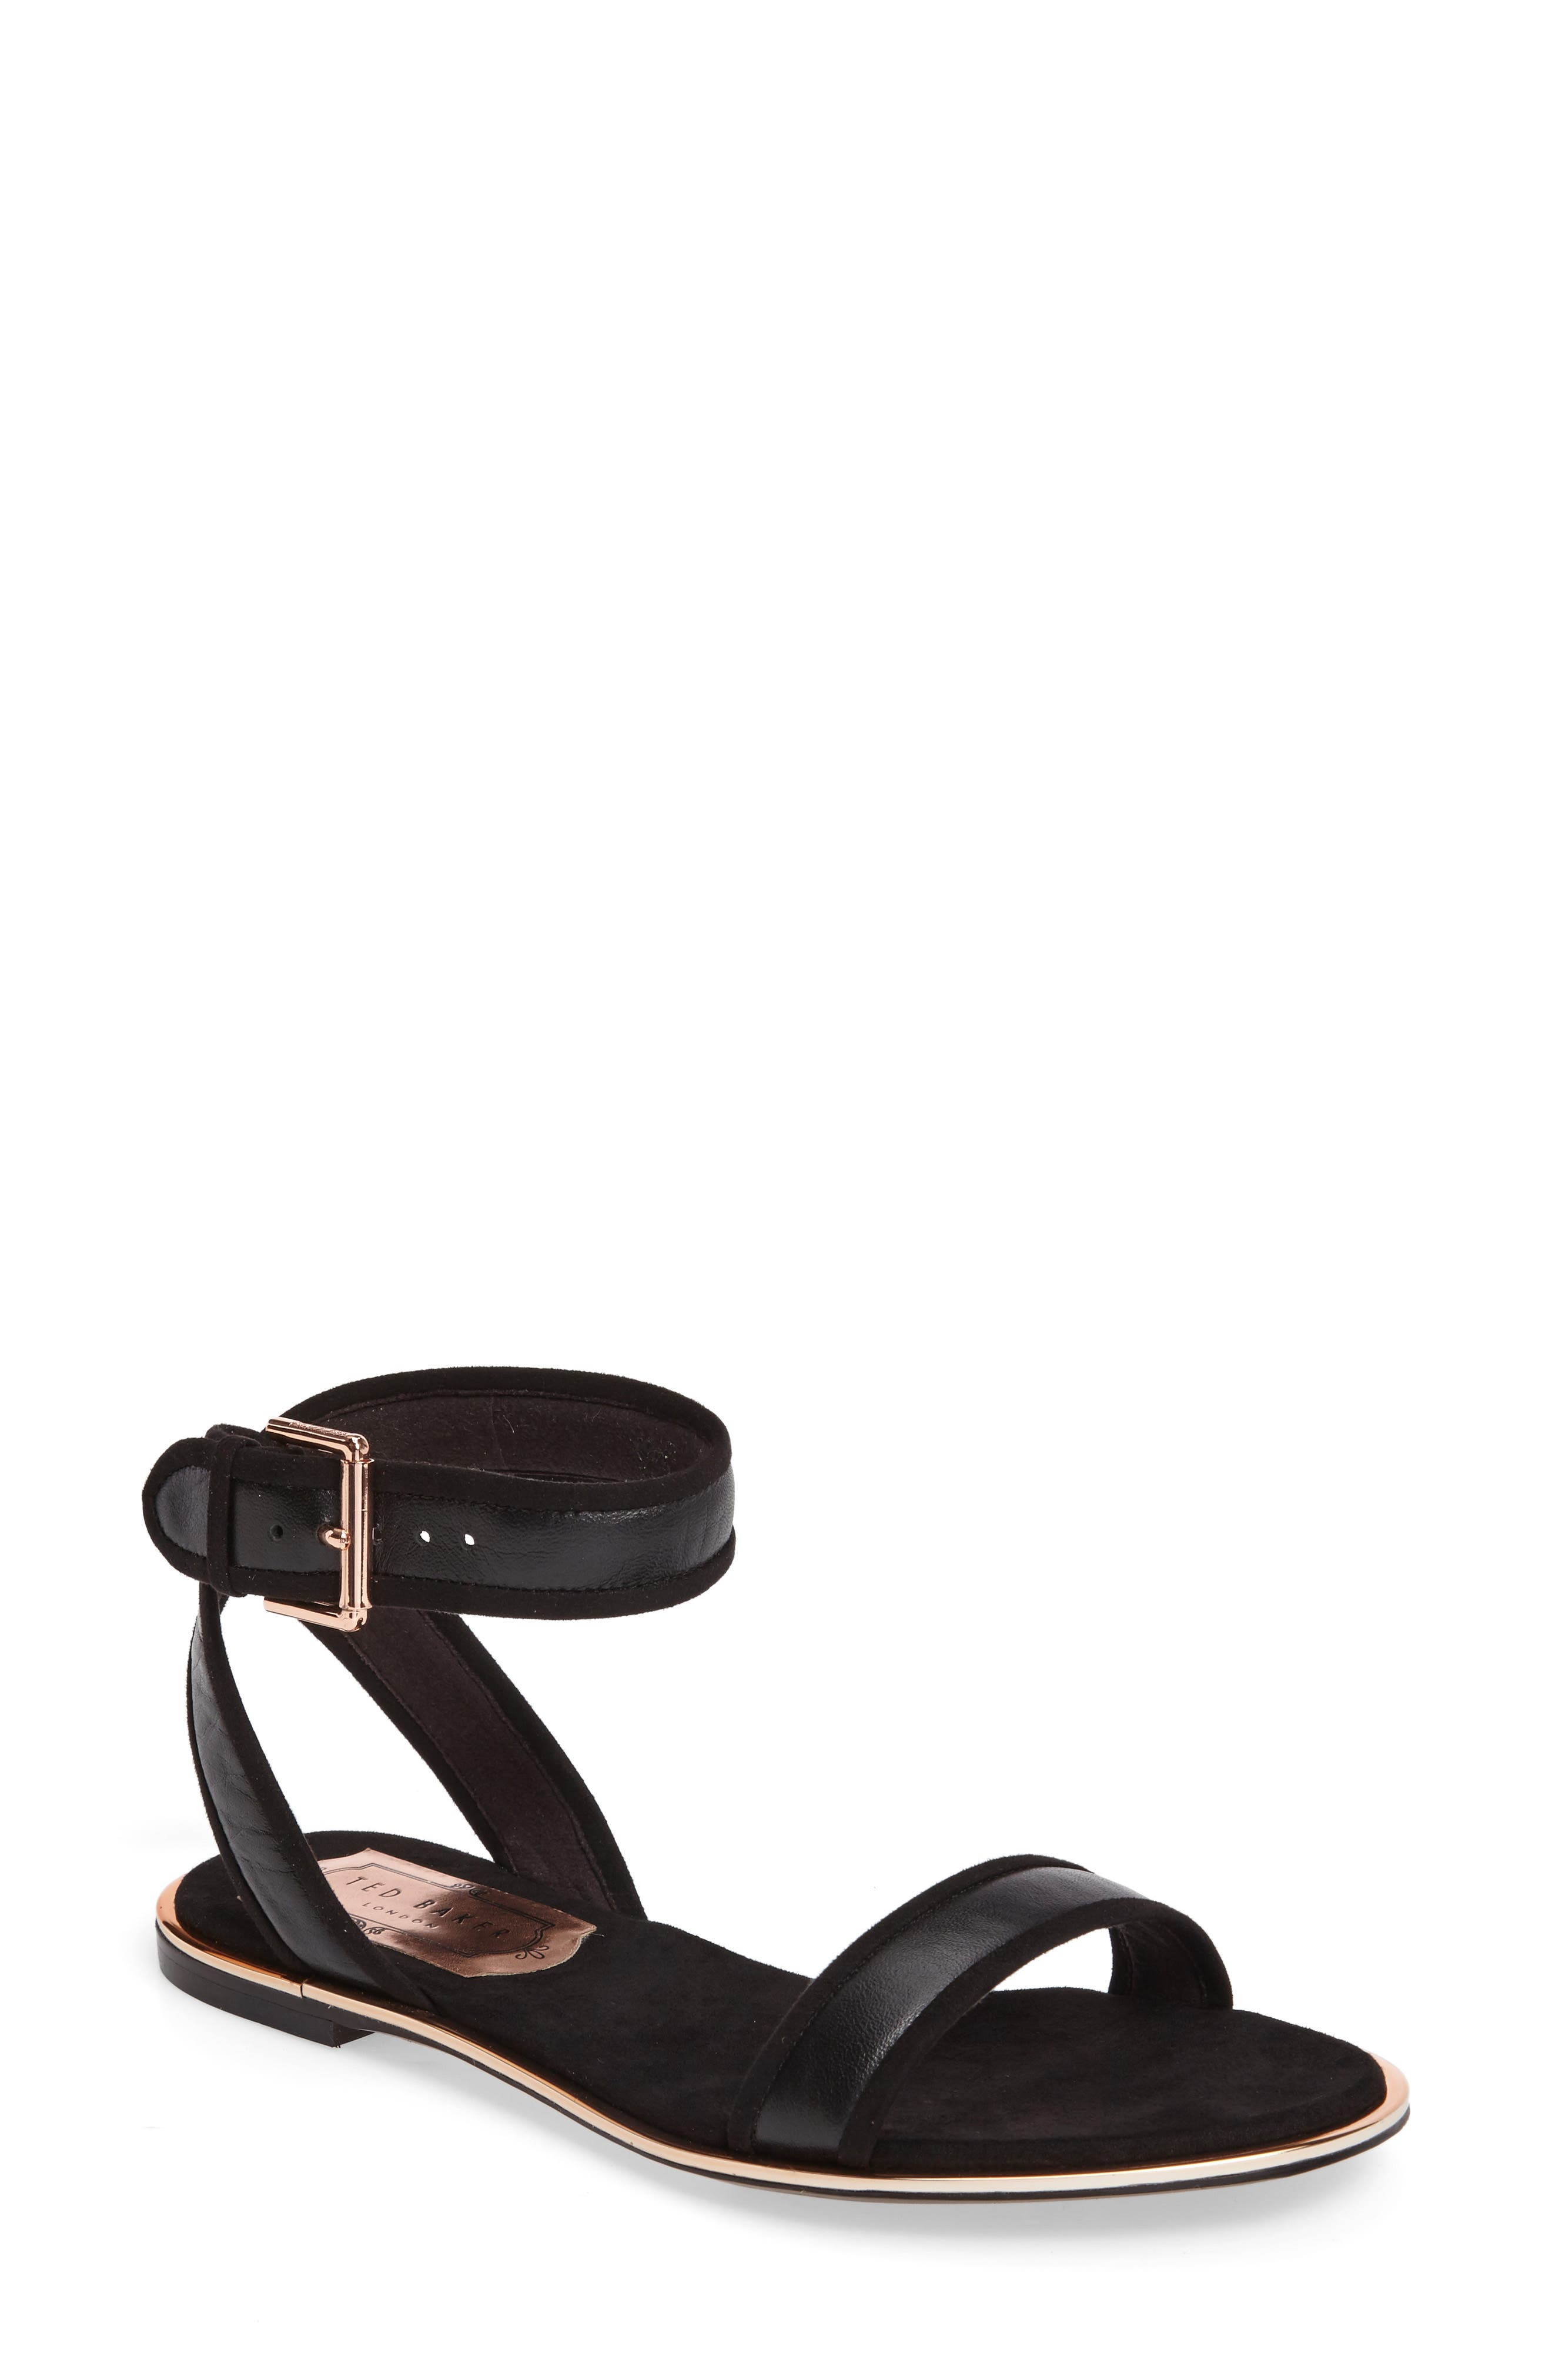 Main Image - Ted Baker Alella Ankle Strap Sandal (Women)